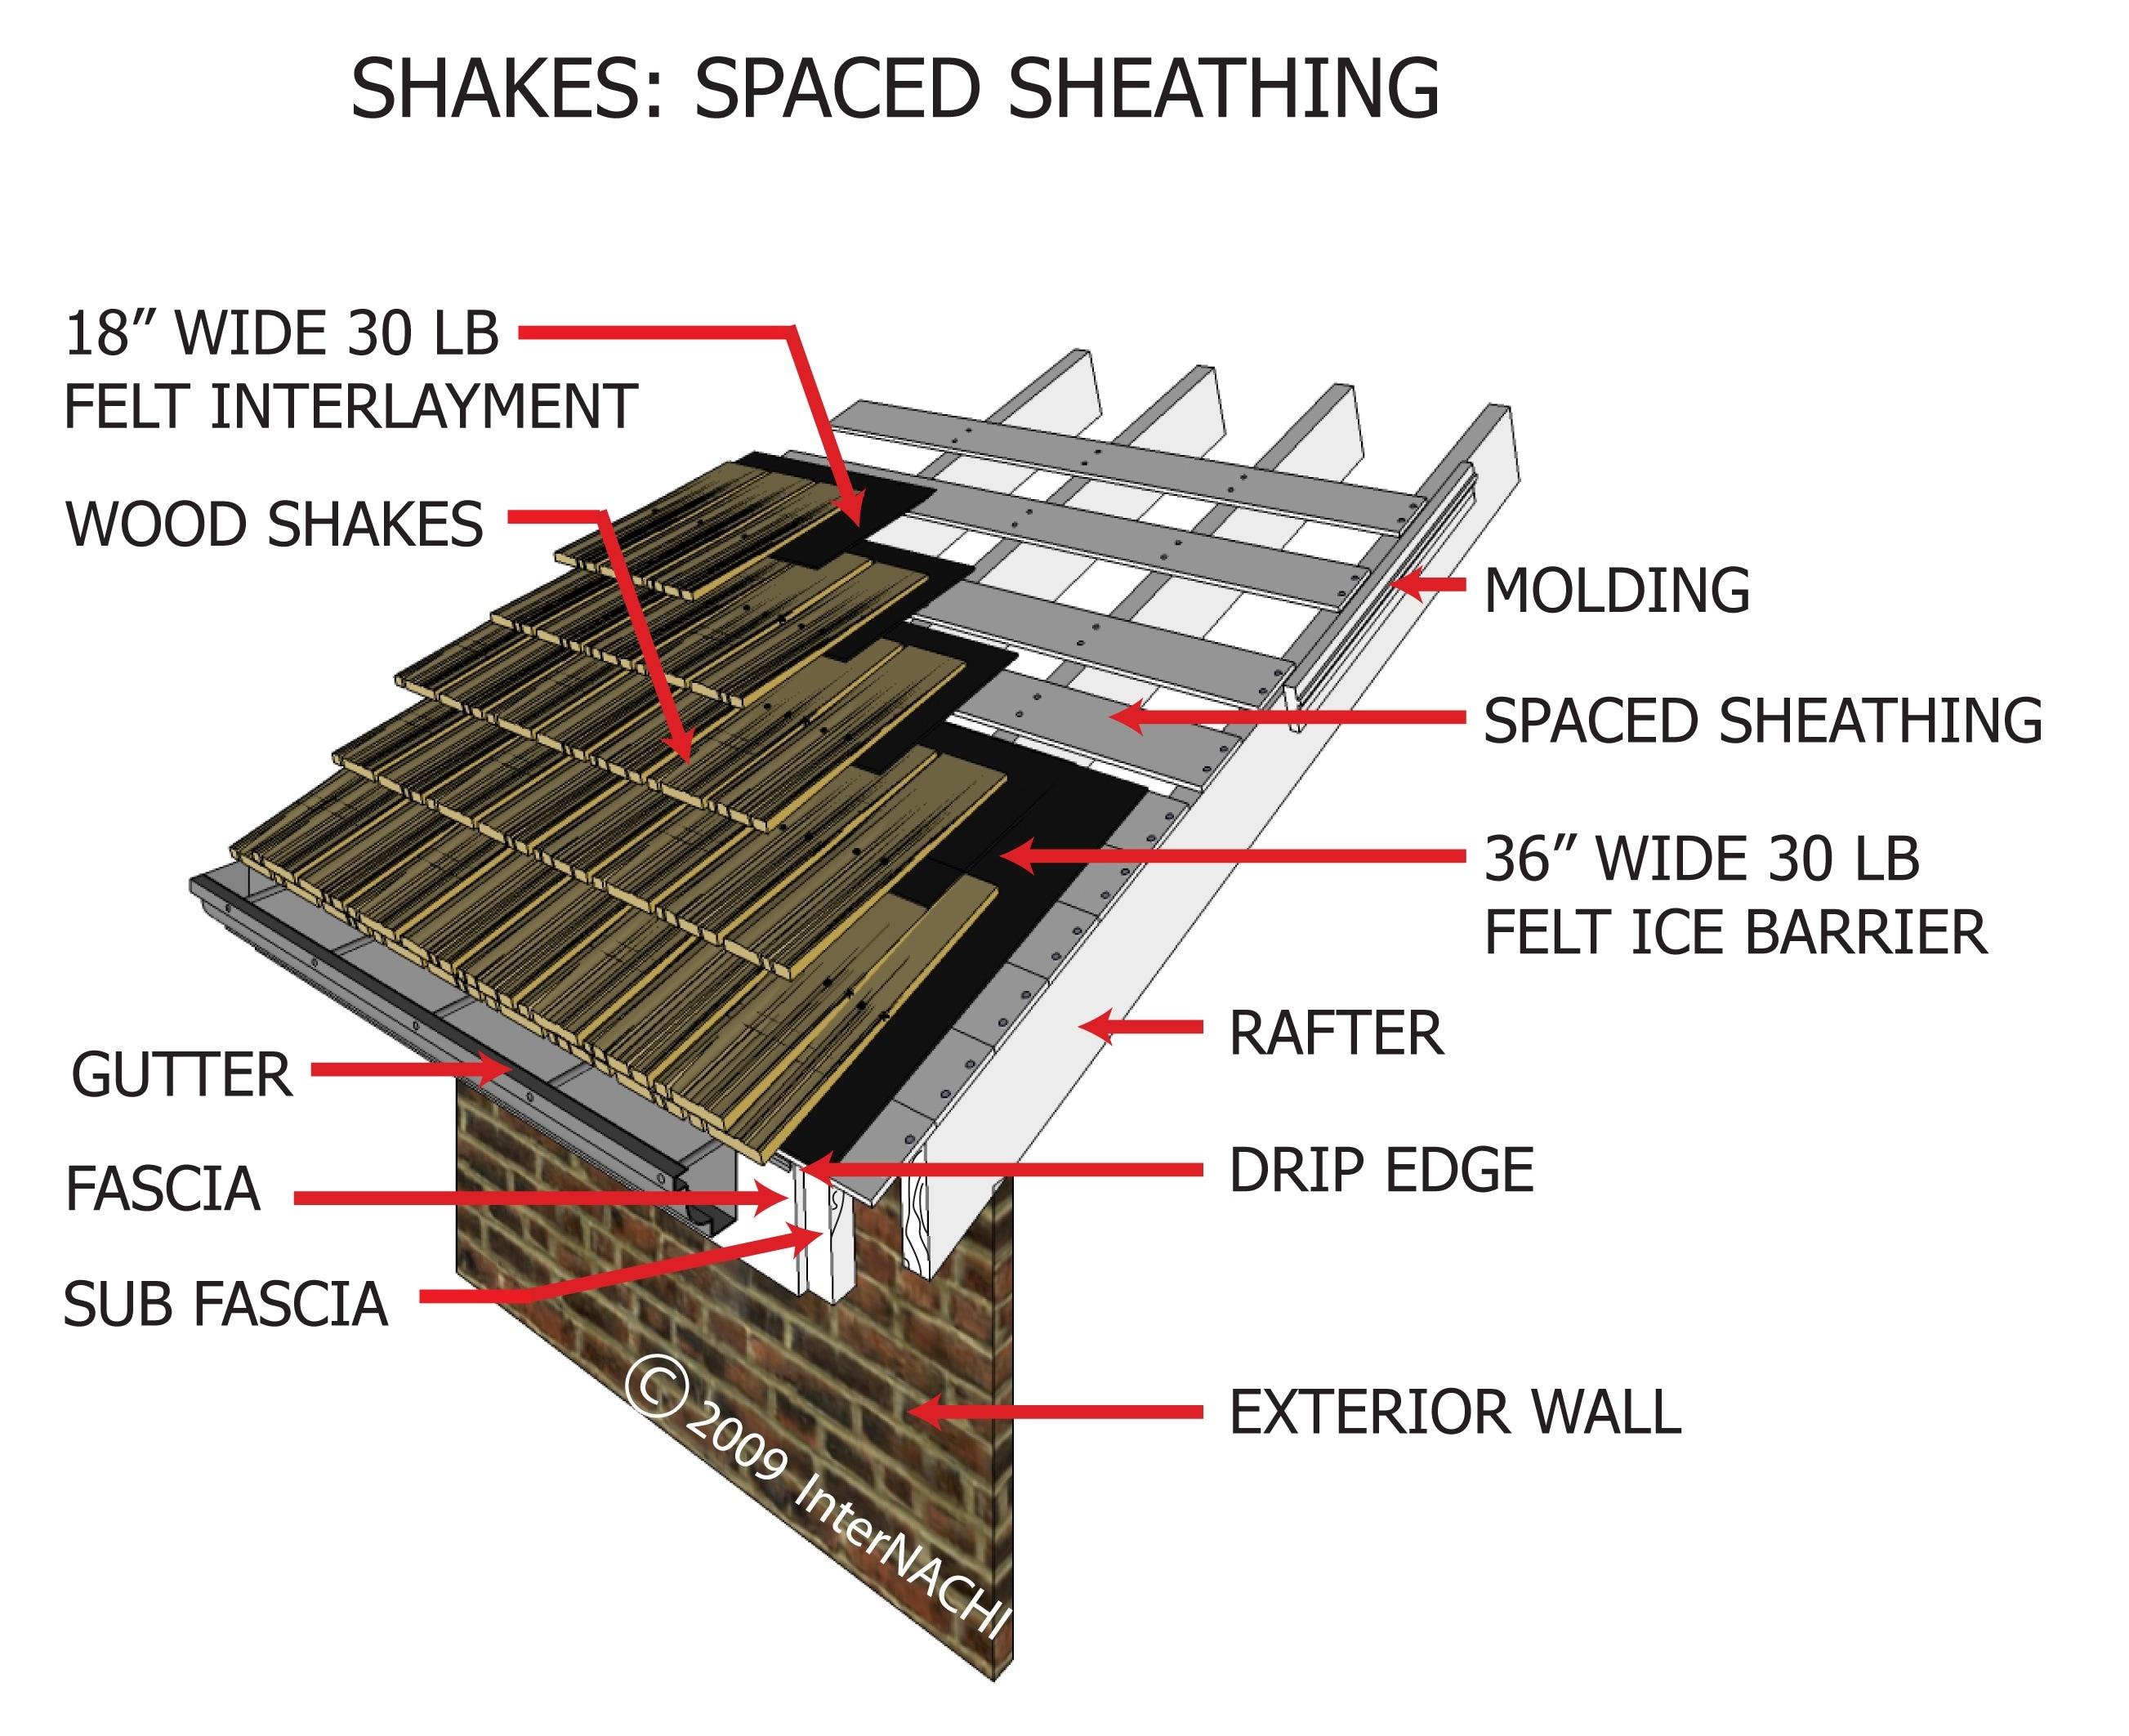 Shakes: Spaced sheathing.